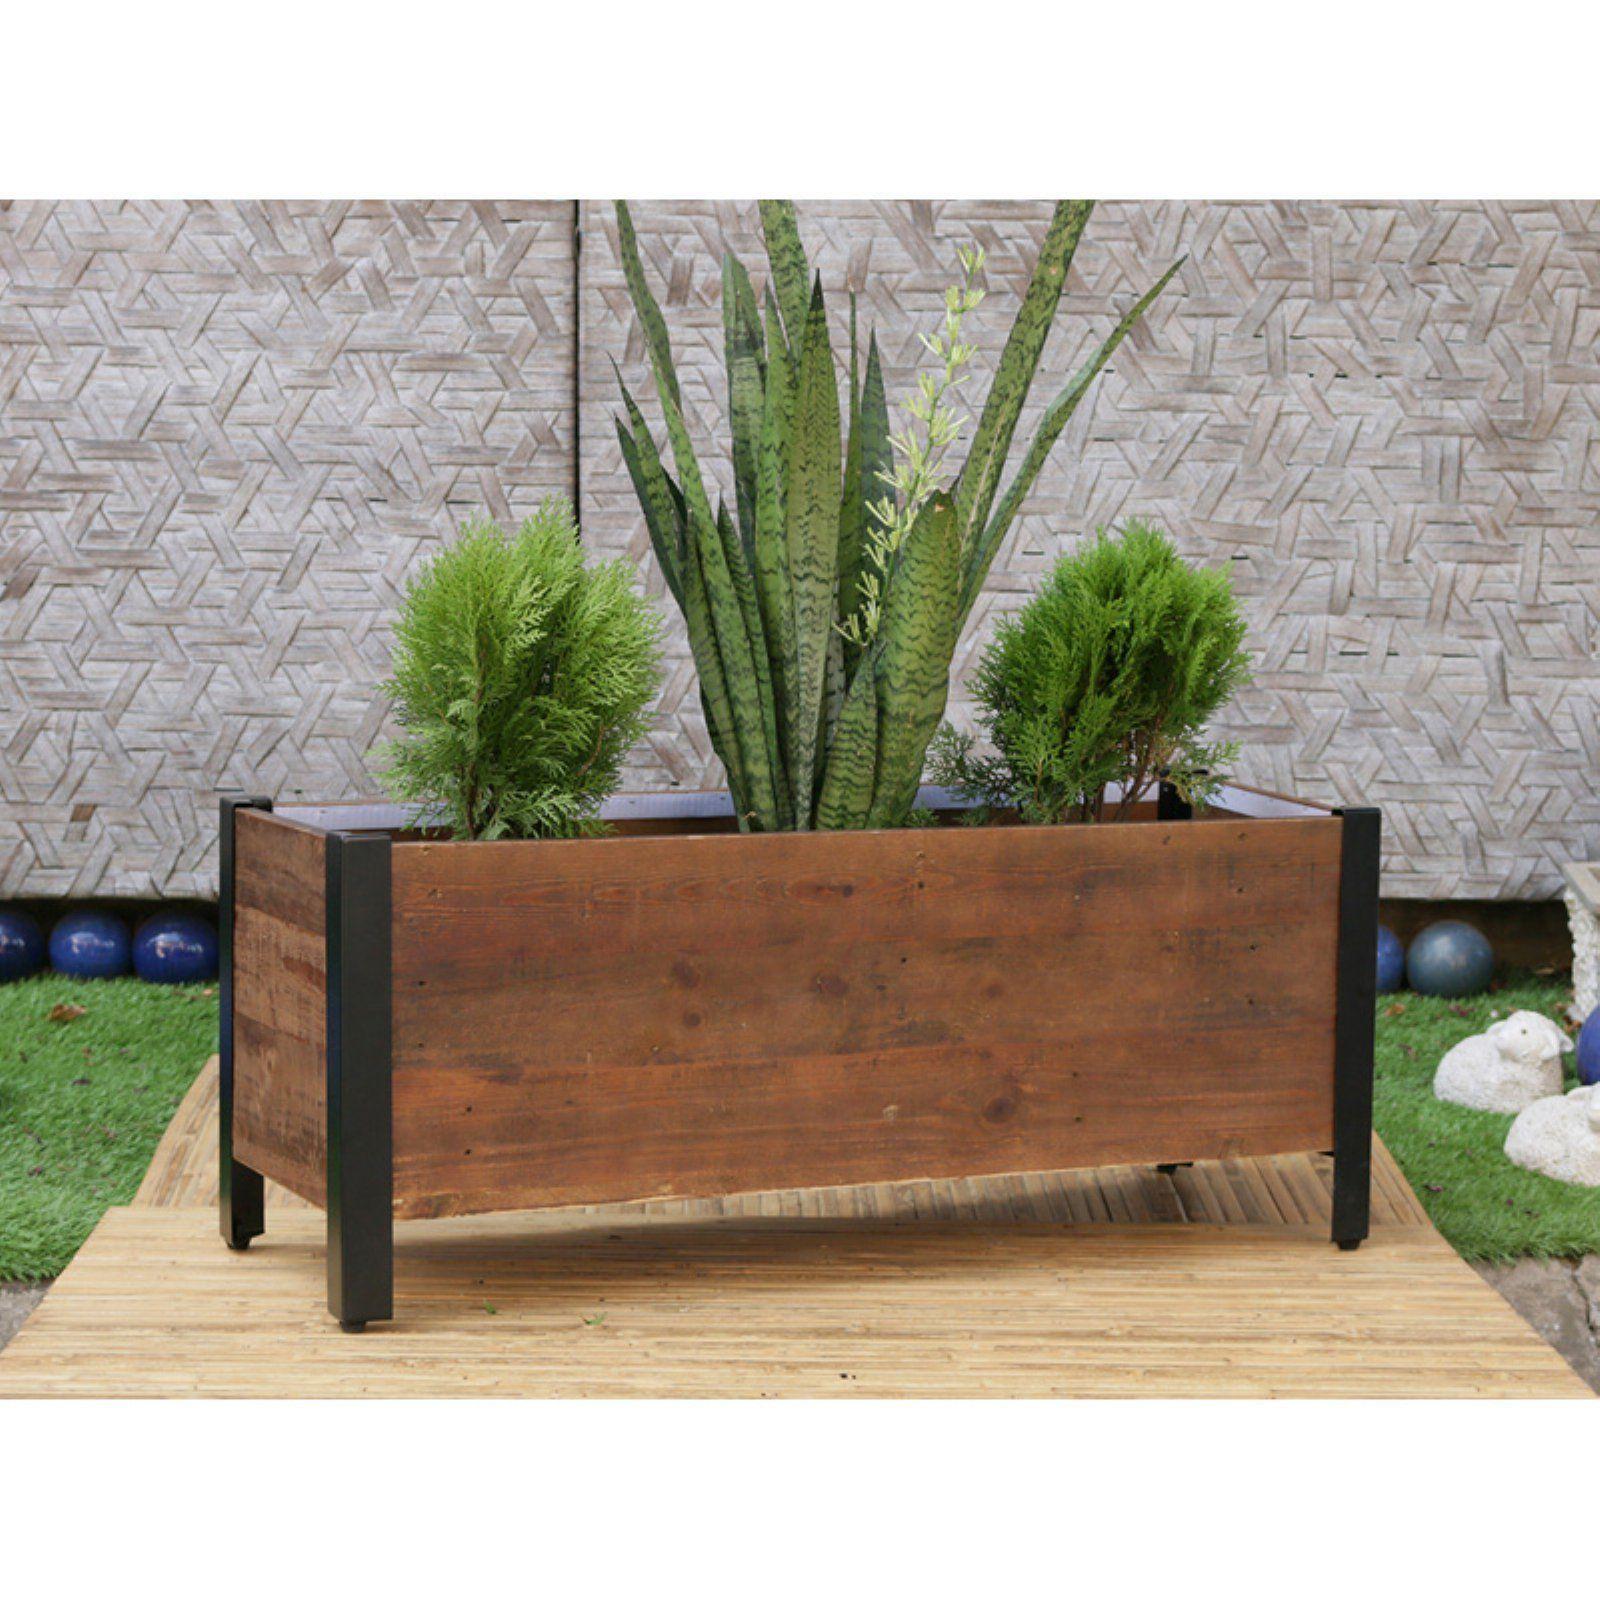 Grapevine Rectangular Urban Garden Wooden Planter Box  Walmartcom #Urbangardening